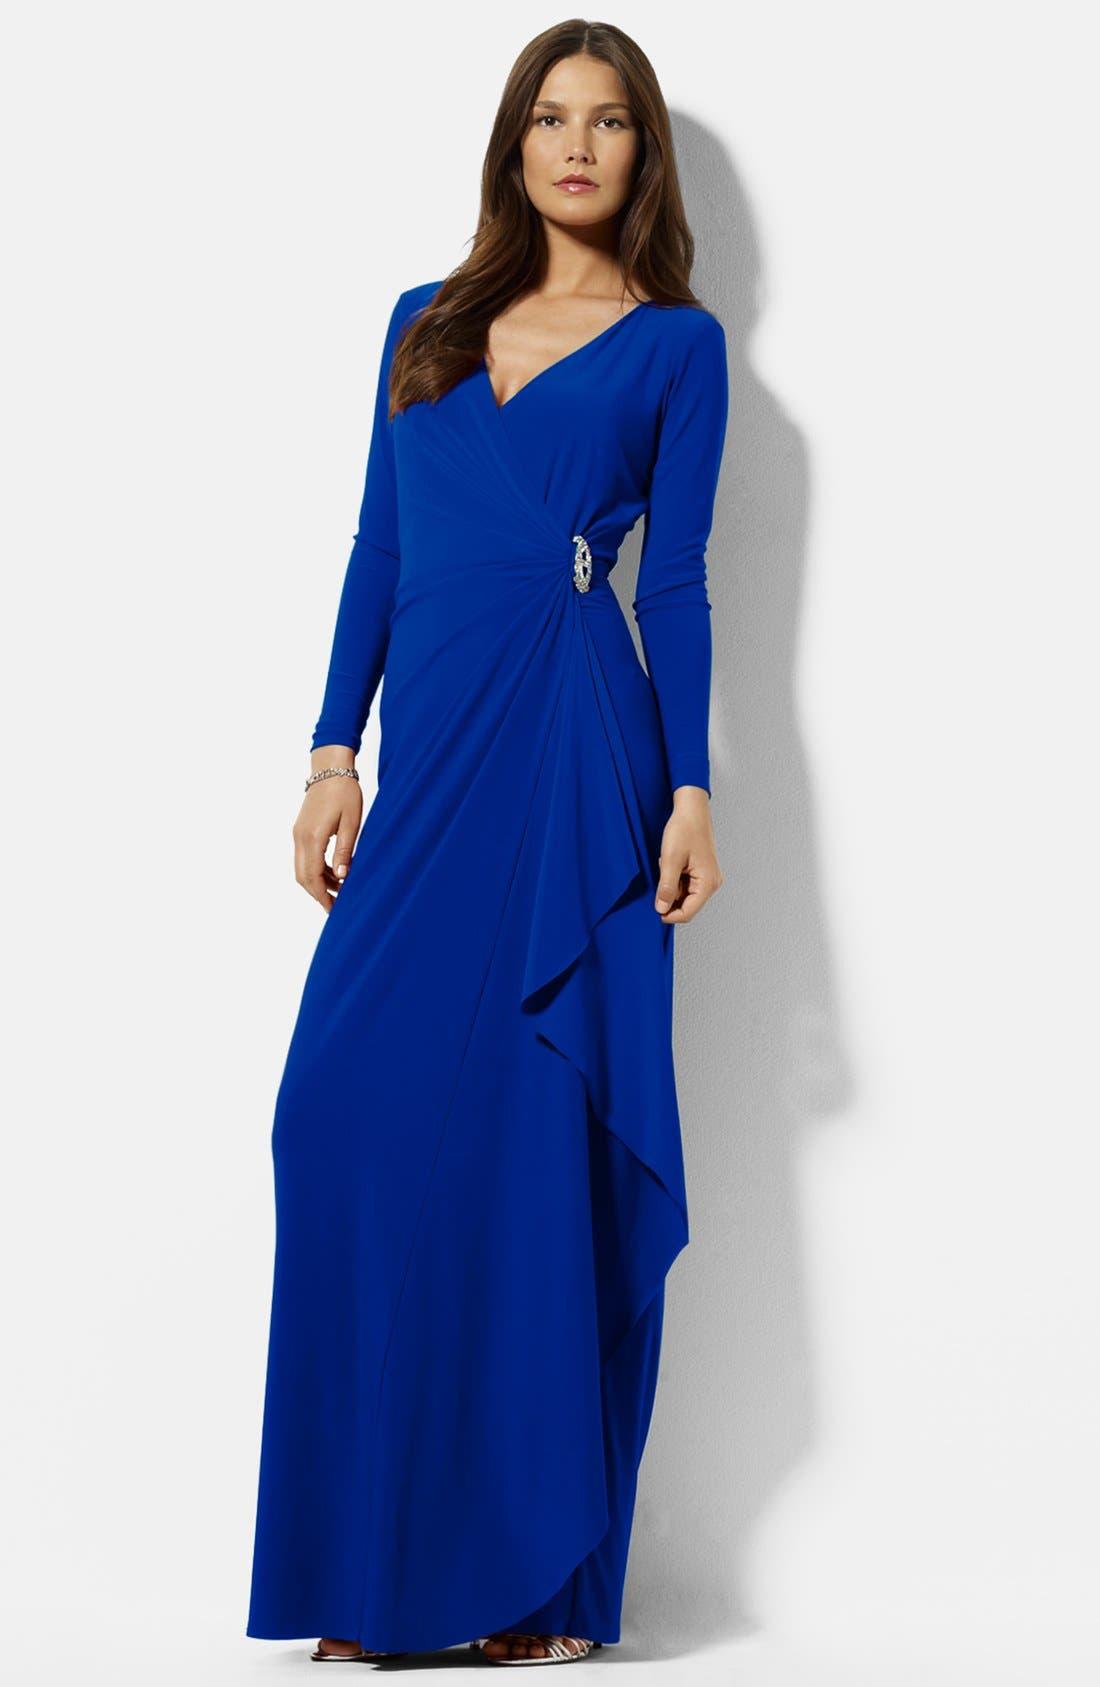 Alternate Image 1 Selected - Lauren Ralph Lauren Embellished Side Drape Jersey Gown